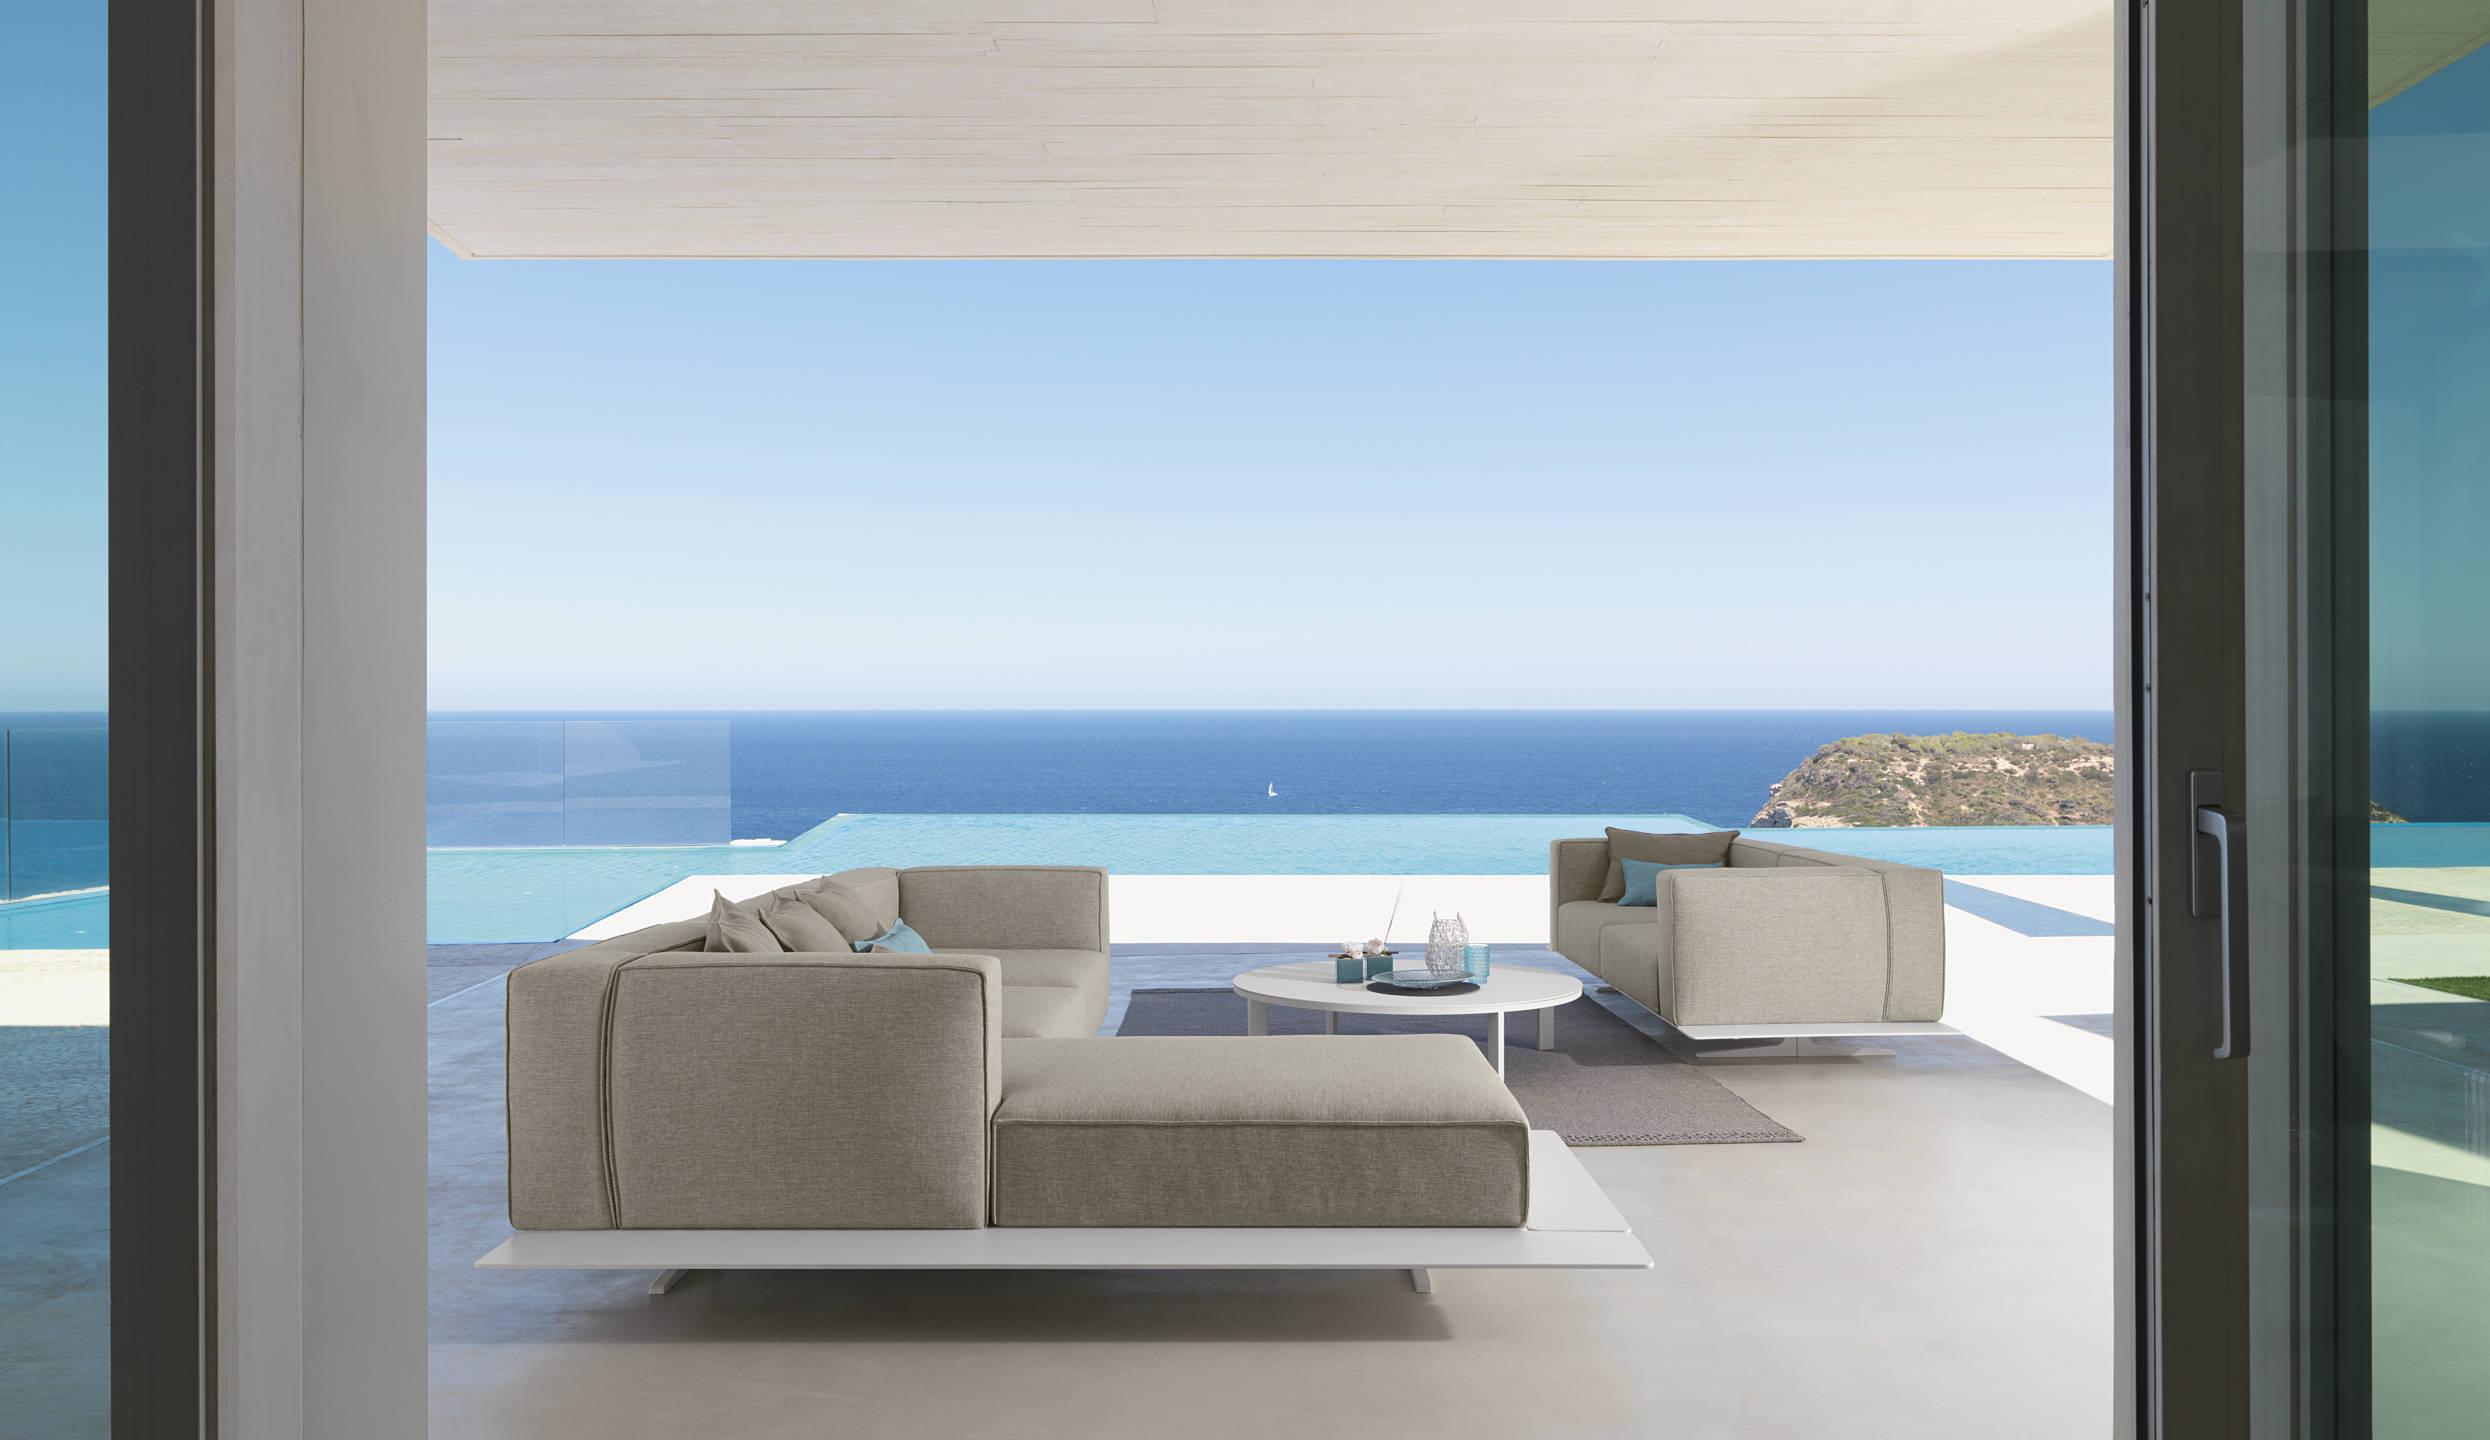 Mobili da giardino outdoor studio d 39 arredo selectiv for Outdoor mobili